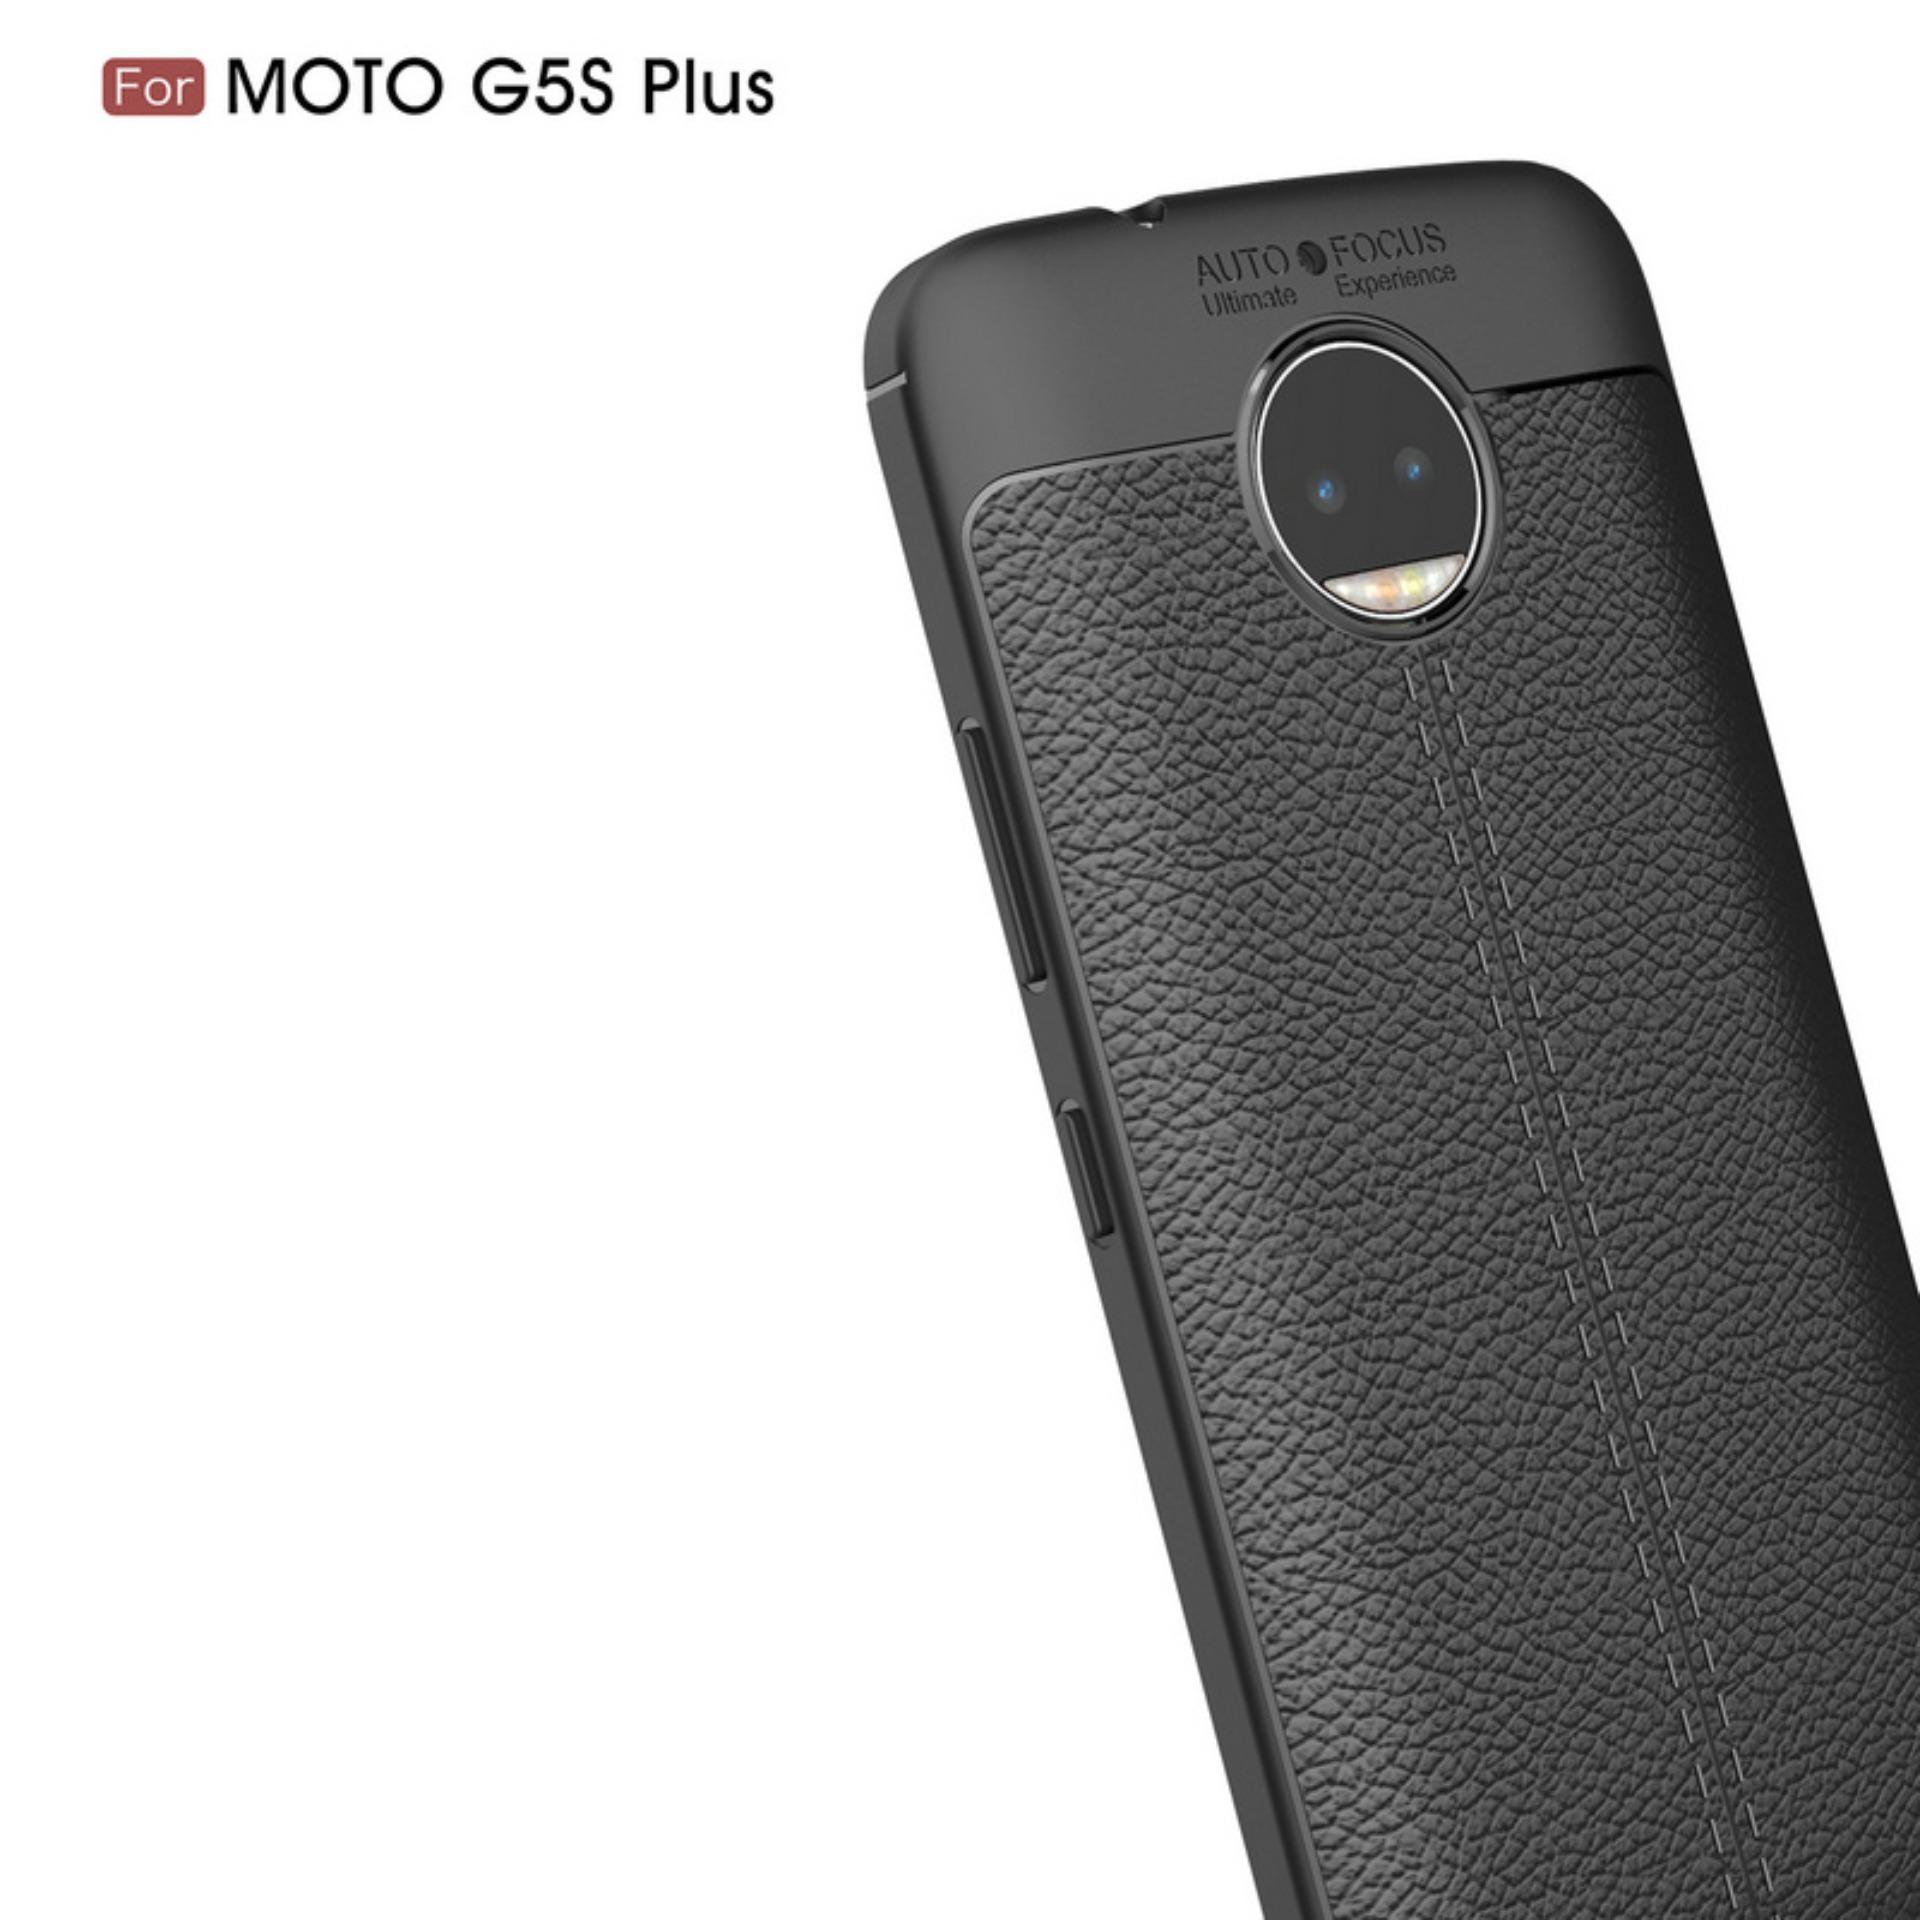 Kehebatan Accessories Hp Premium Ultimate Shockproof Leather Case Tempered Glass Motorola Moto E4 Plus Full Cover Warna For G5s